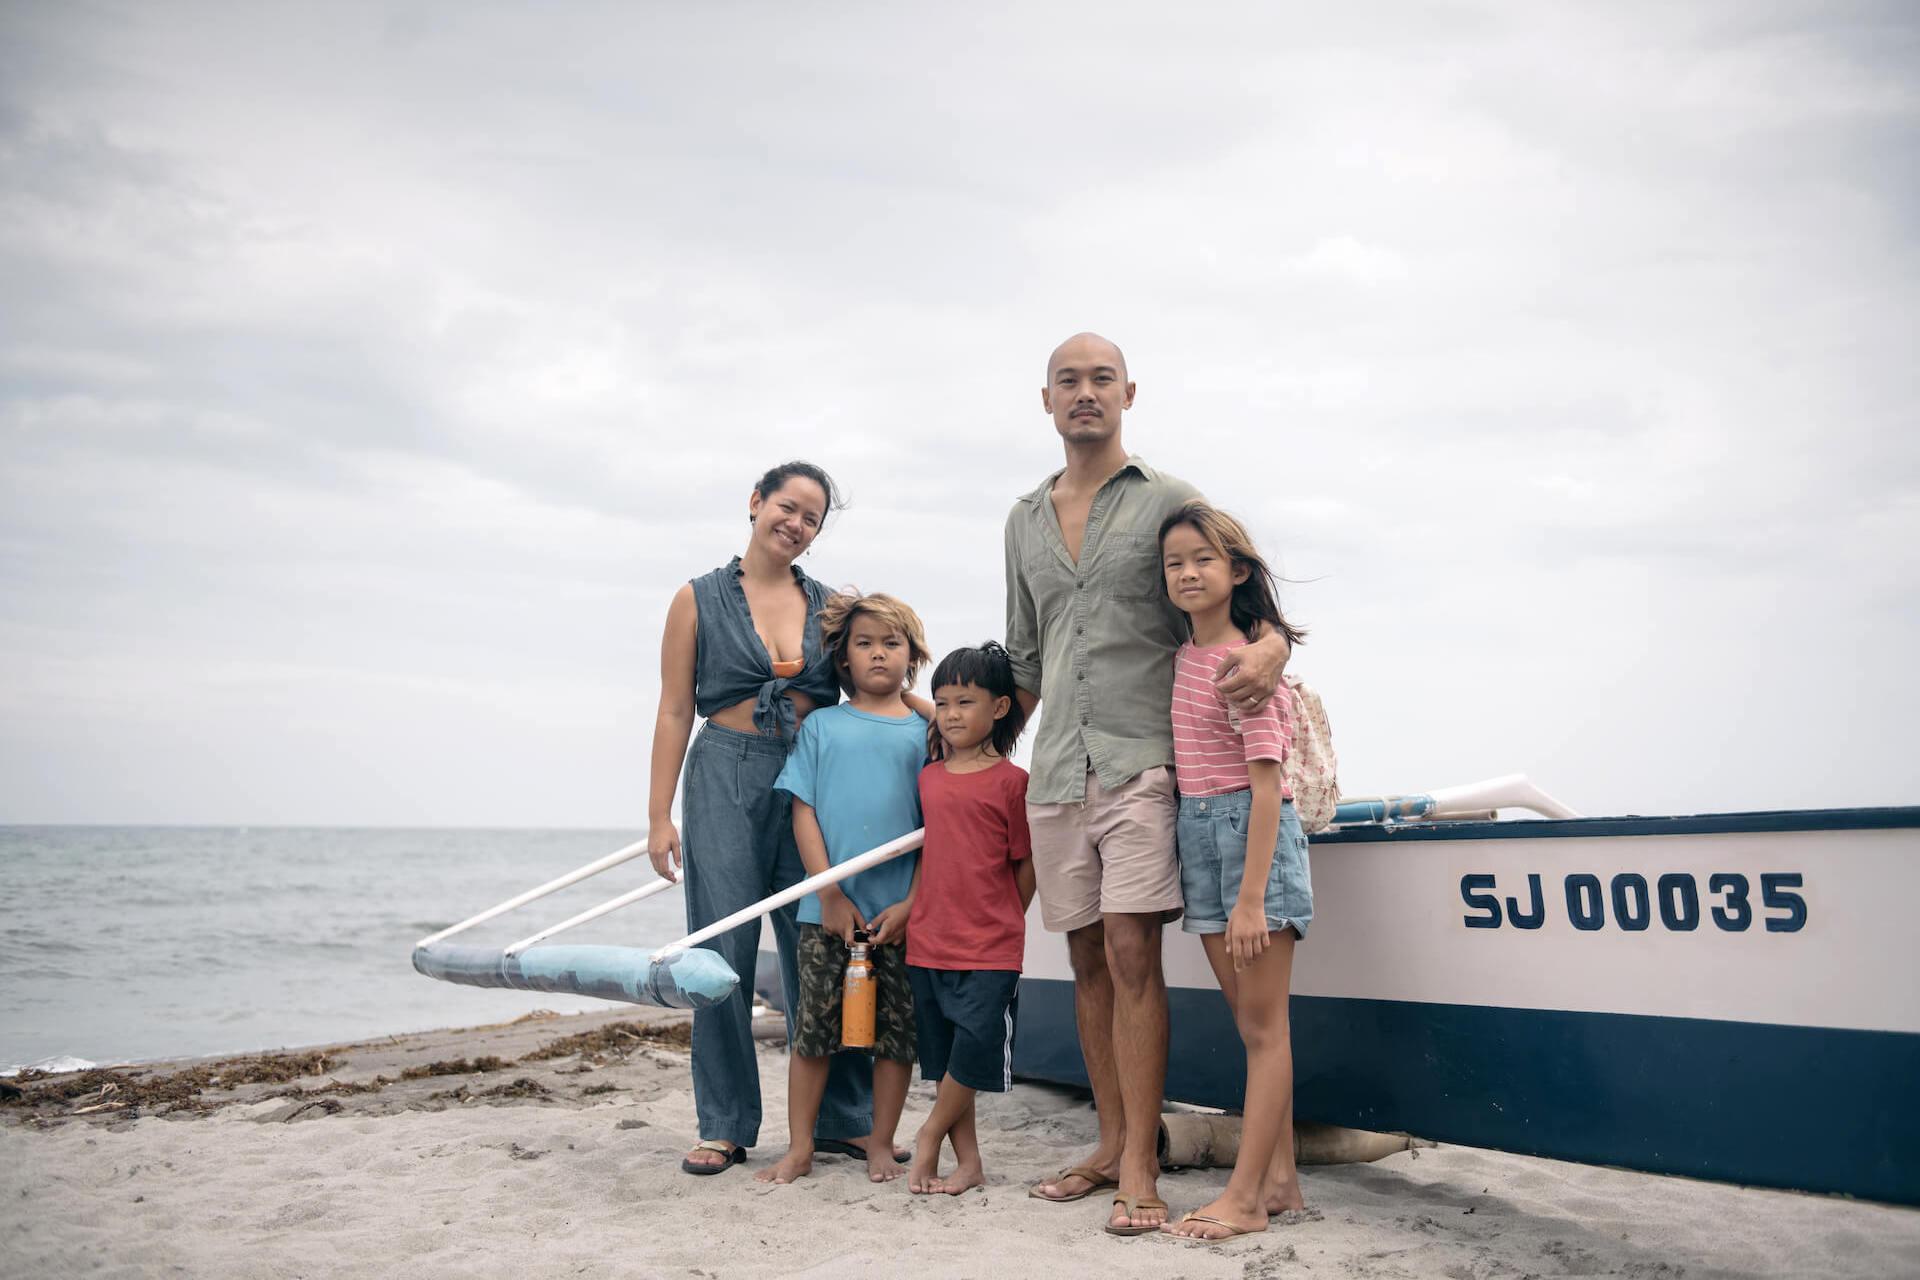 Kiddo and Amy Cosio and family in La Union beach. Photo by Tarish Zamora